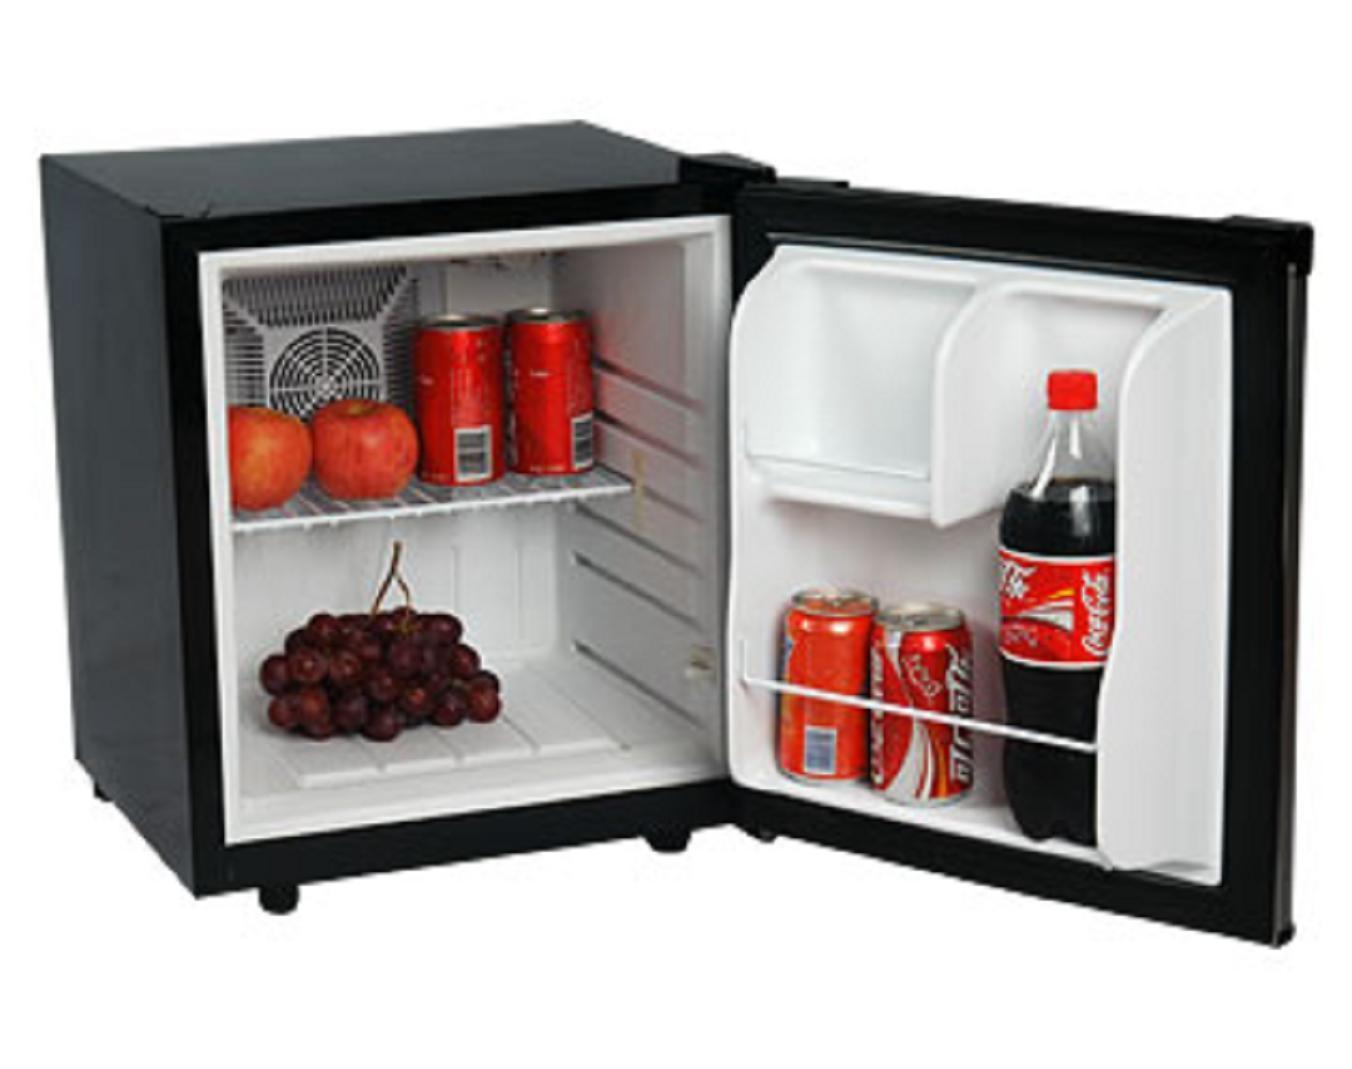 medium resolution of harga freezer cooler harga 11